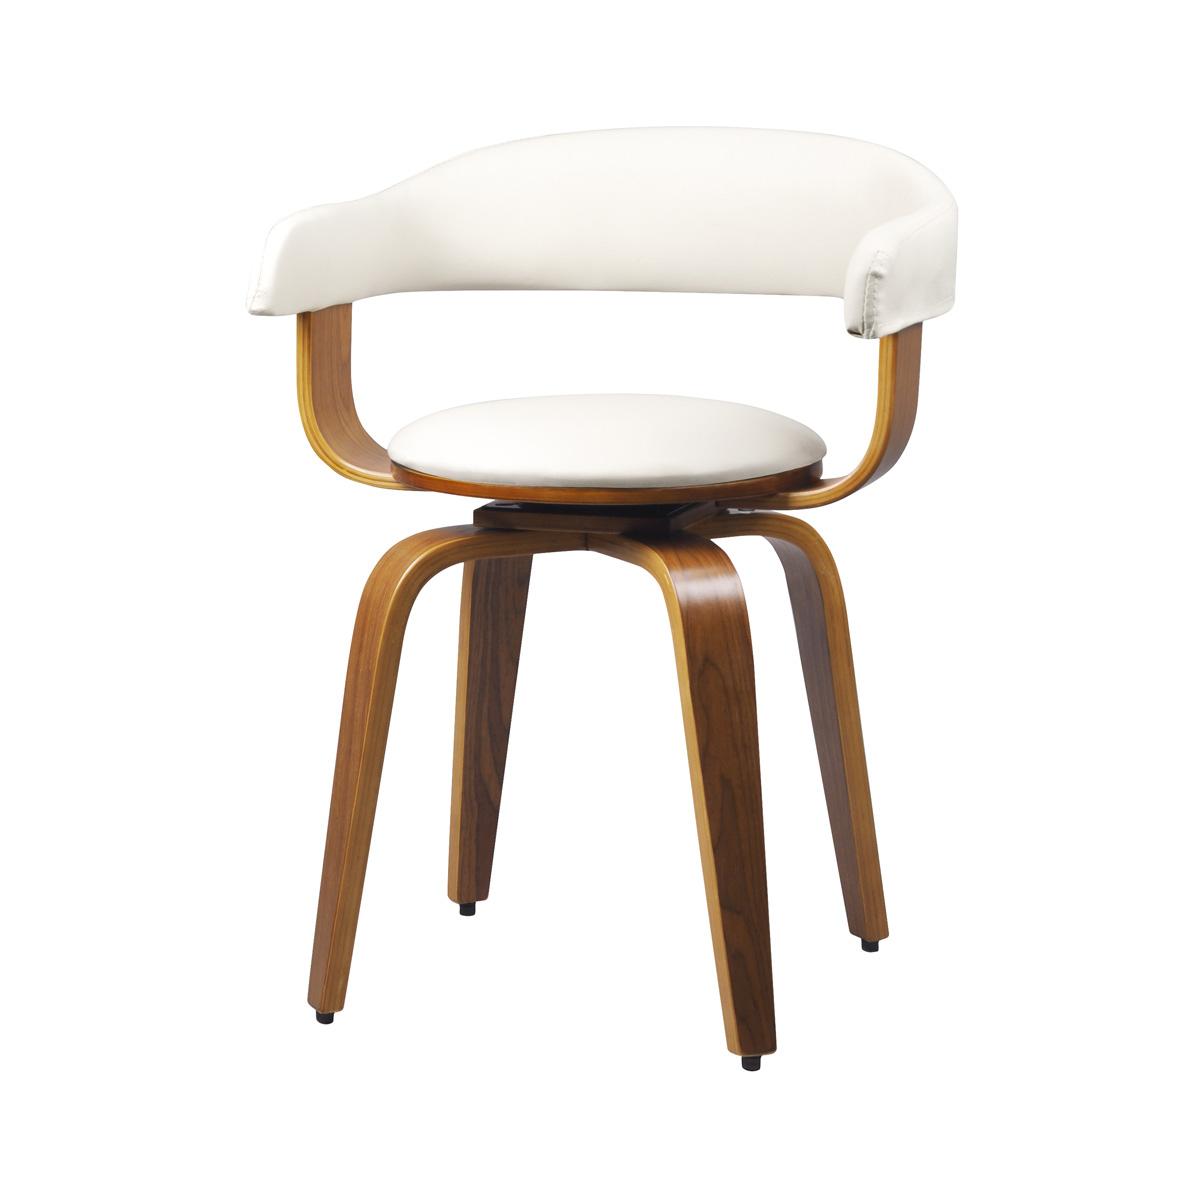 Chaise avec accoudoirs en cuir synthétique blanc